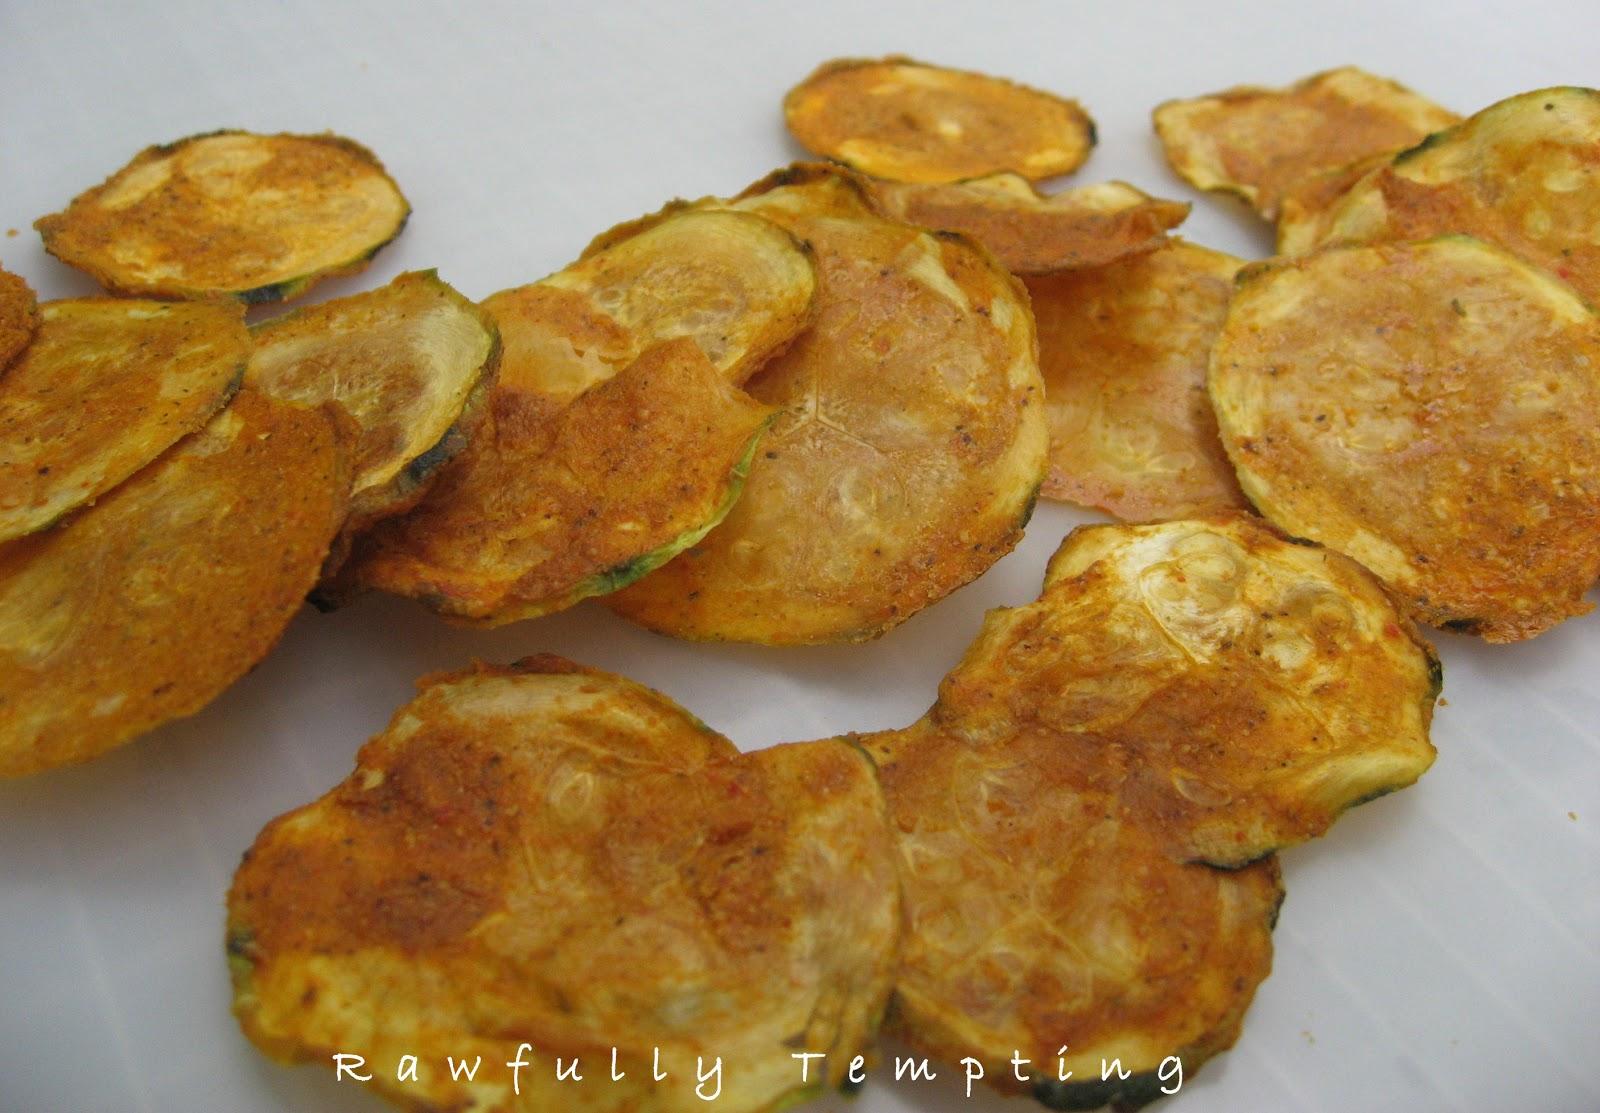 ... chips carrot chips potato chips donut chips carrot chips potato chips